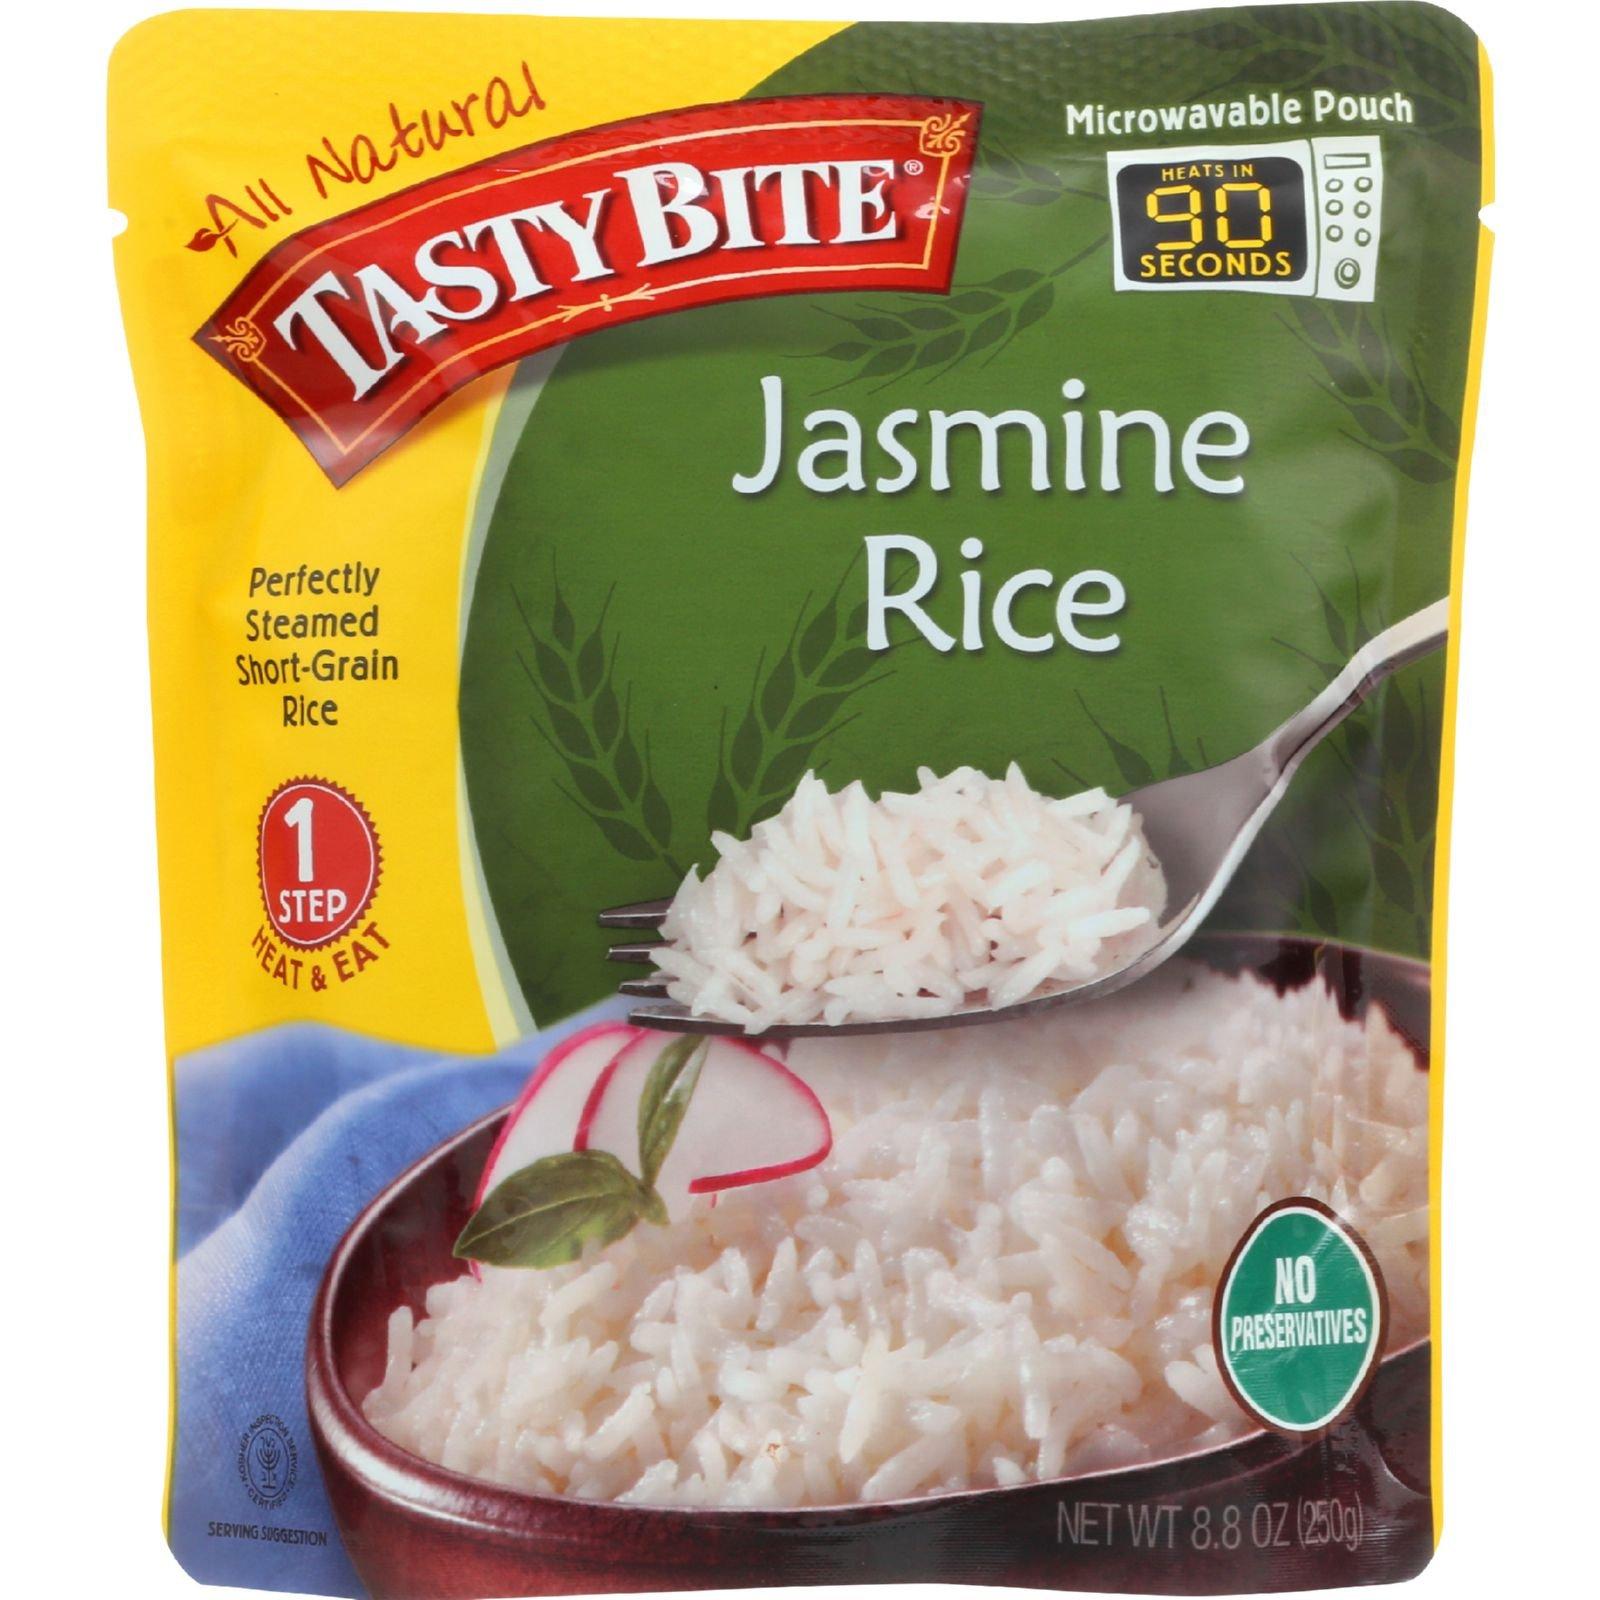 Tasty Bite Rice - Jasmine - 8.8 oz - case of 6 - Gluten Free -